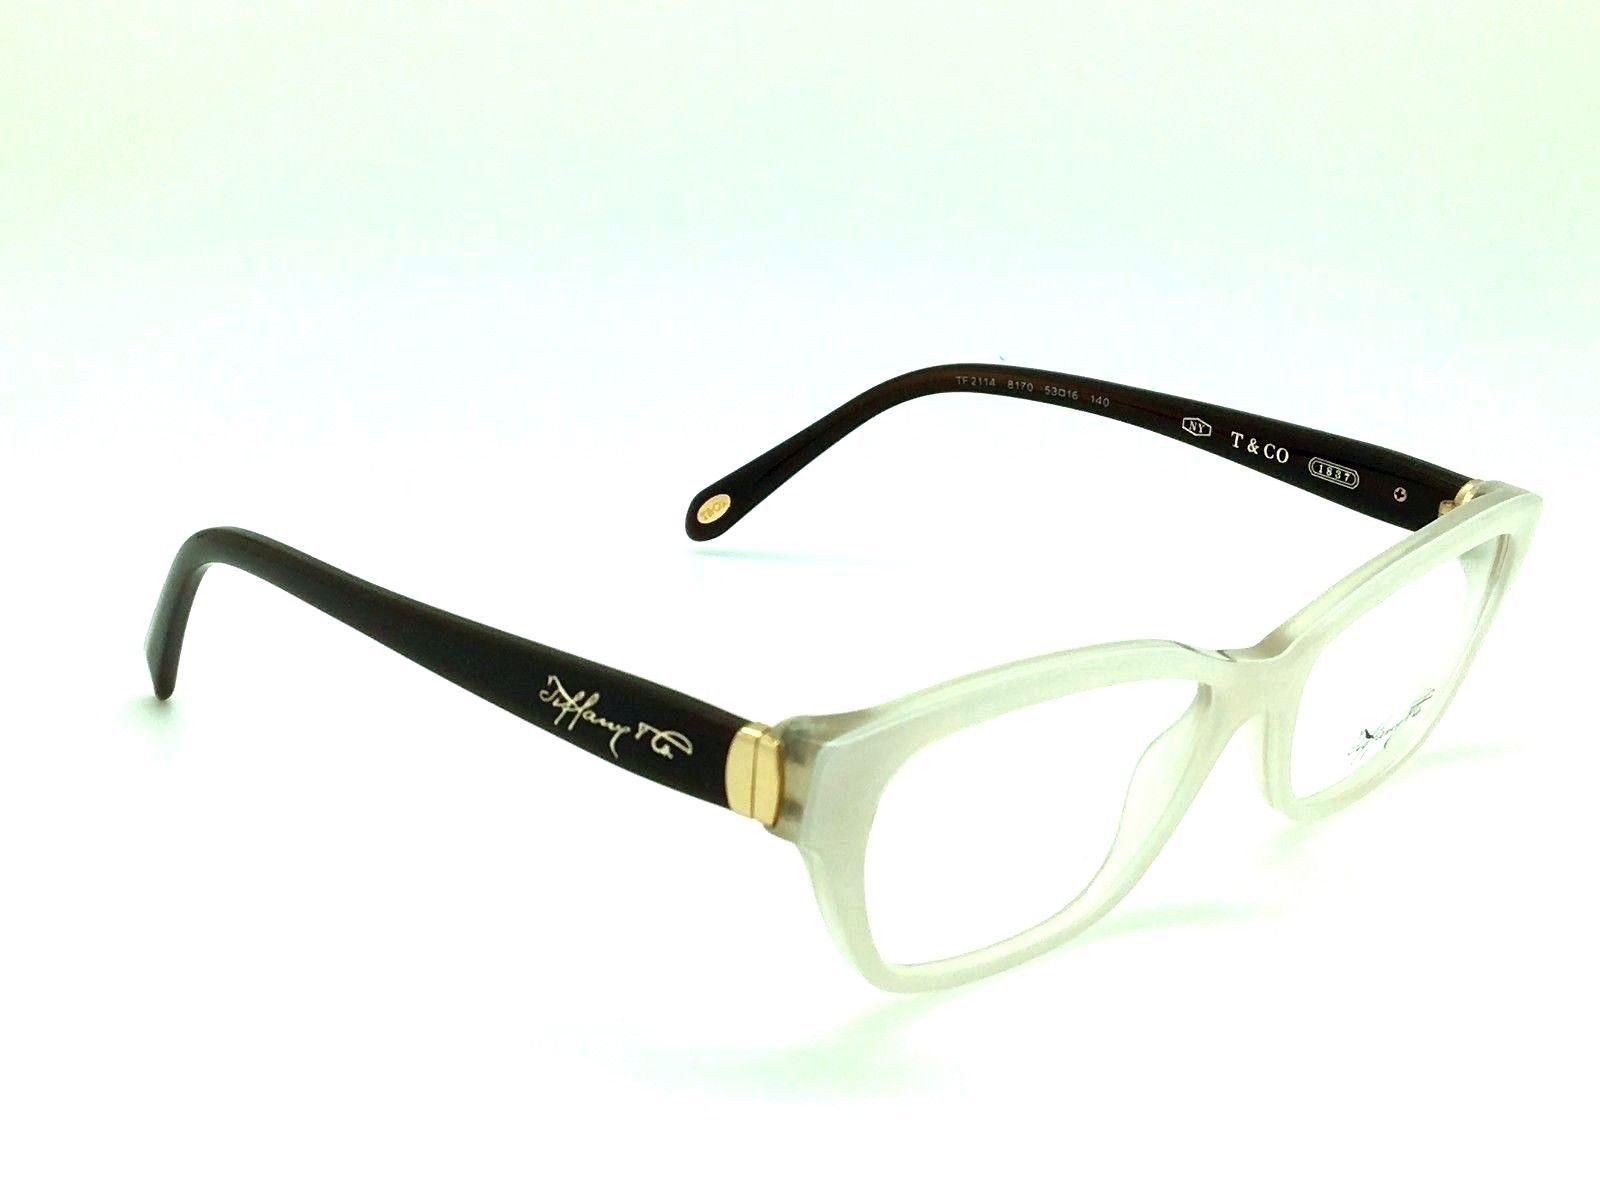 9a505b0b52b New Tiffany   Co. TF 2114 8170 Authentic Eyeglasses Pearl Ivory Fast  Shipping